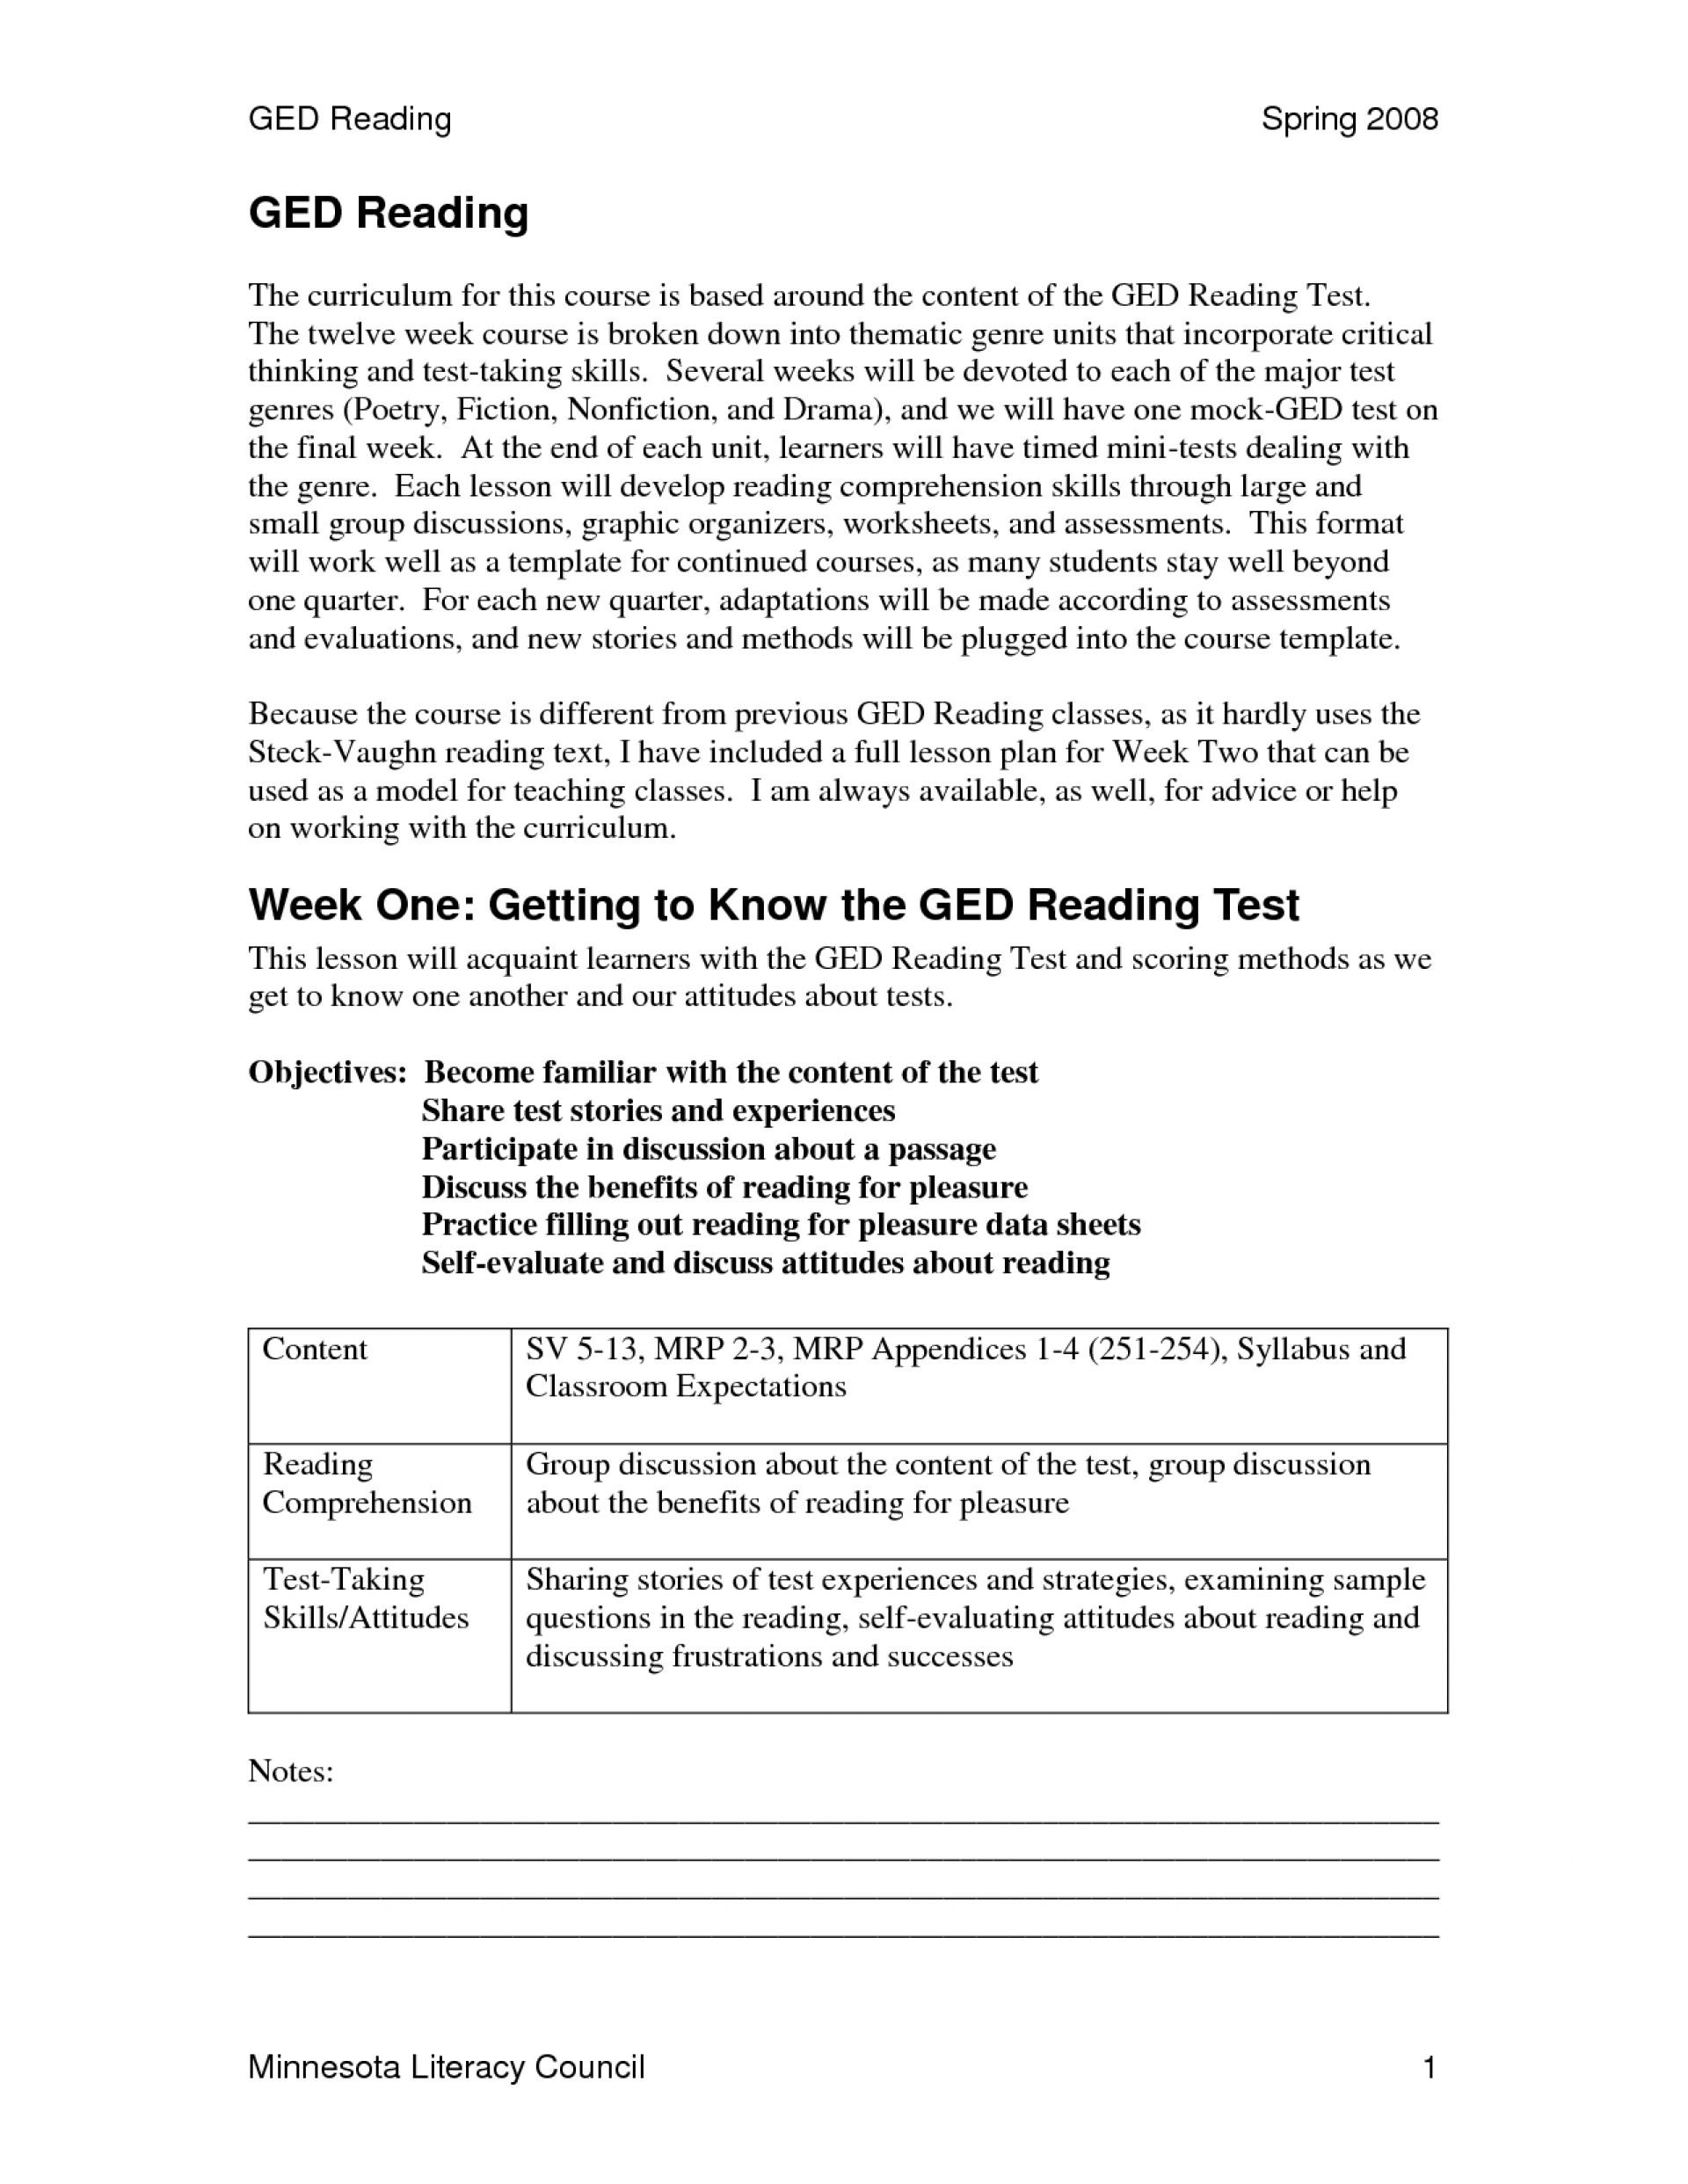 007 Ged Essay Samples Example Practice Test Printable Worksheets - Ged Reading Practice Test Free Printable